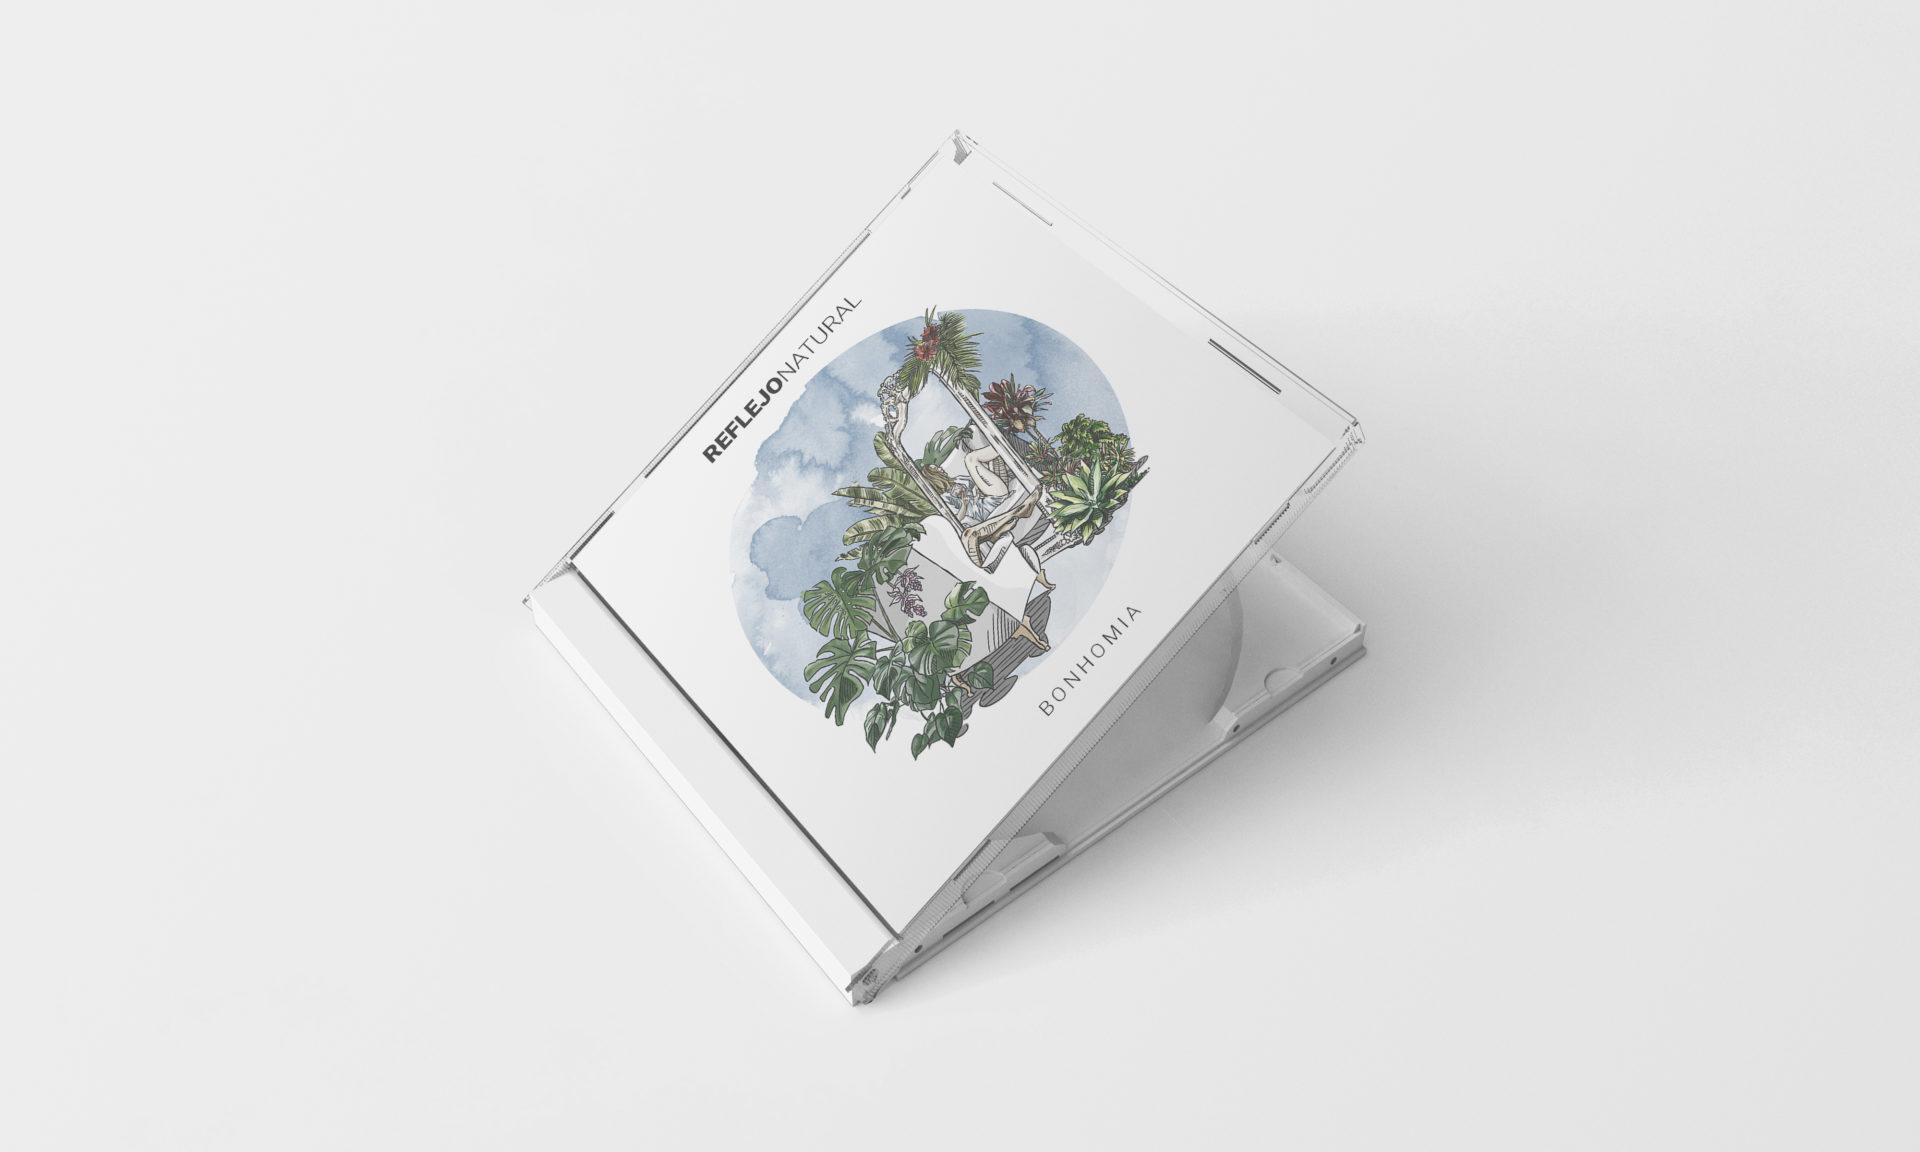 Disco físico música ilustrado evacortesilustra